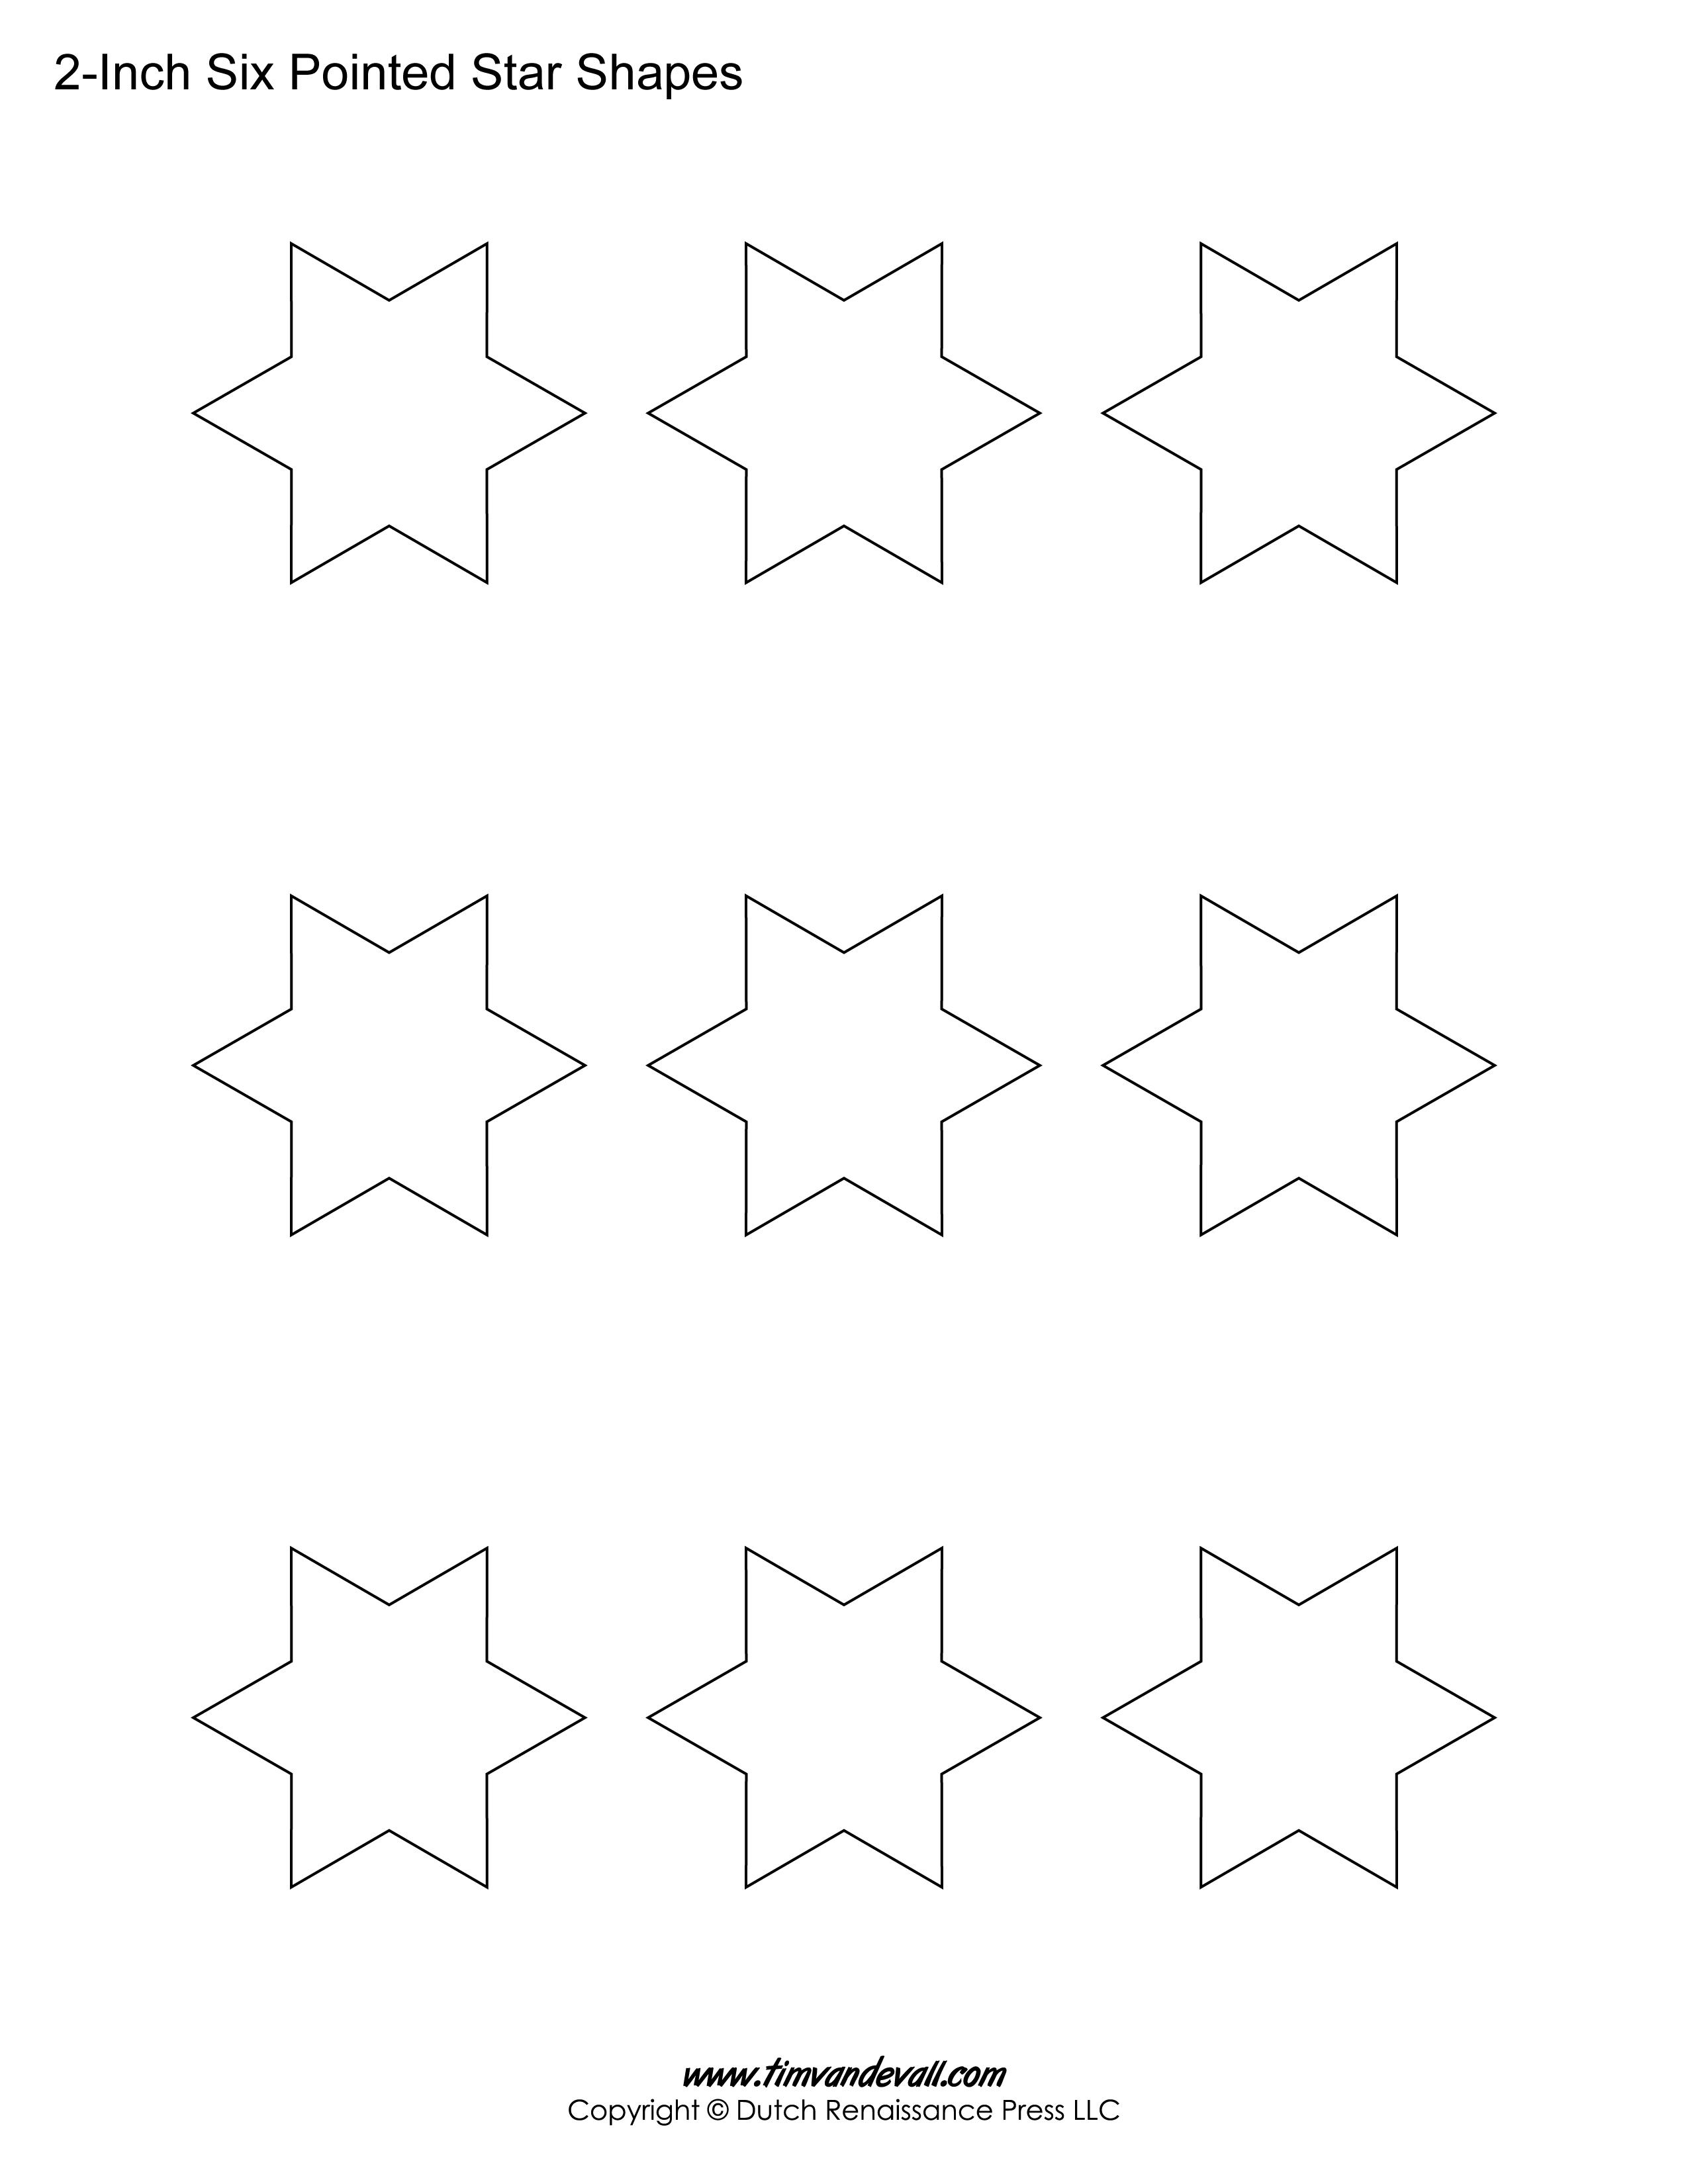 6 sided stars